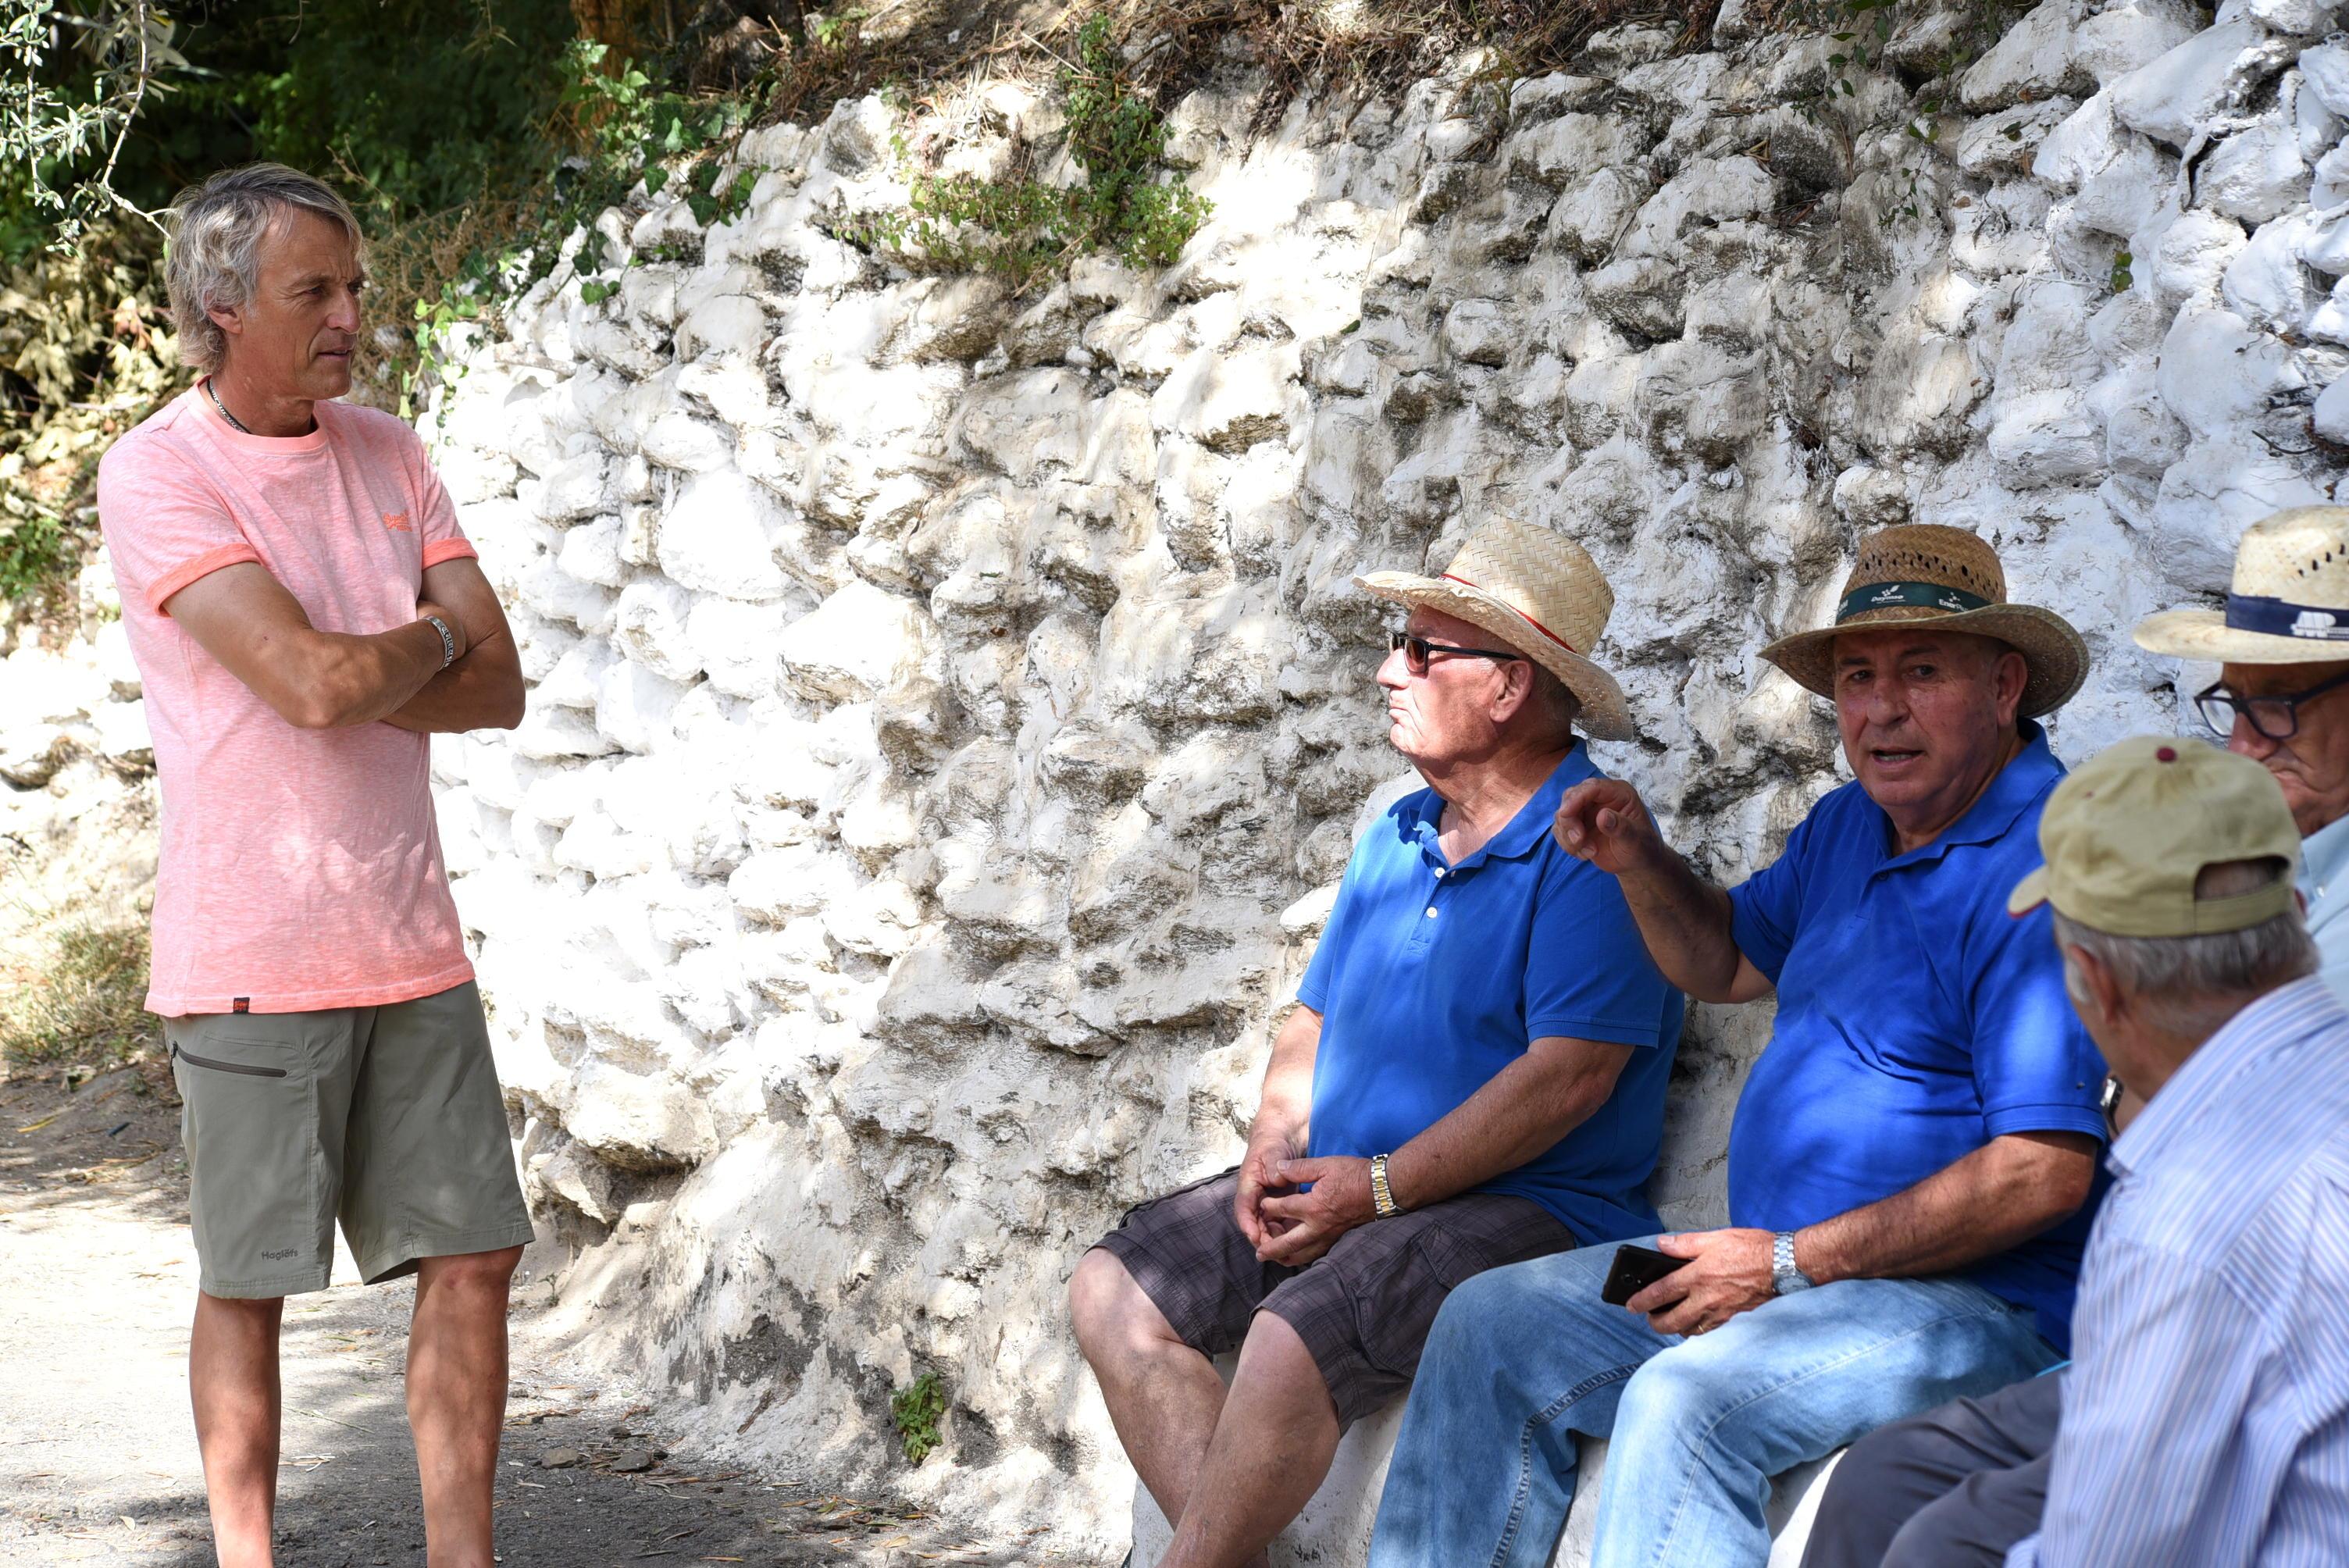 Mañana se estrena el programa que Jesús Calleja grabó en la Alpujarra